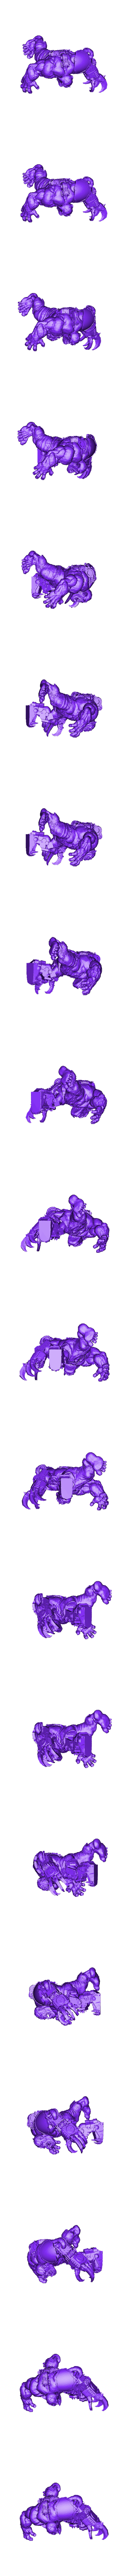 Ultra_Hulky_Mega_Ork_Nob.stl Télécharger fichier STL gratuit Ultra Hulky Mega Ork Nob • Plan imprimable en 3D, 40Emperor